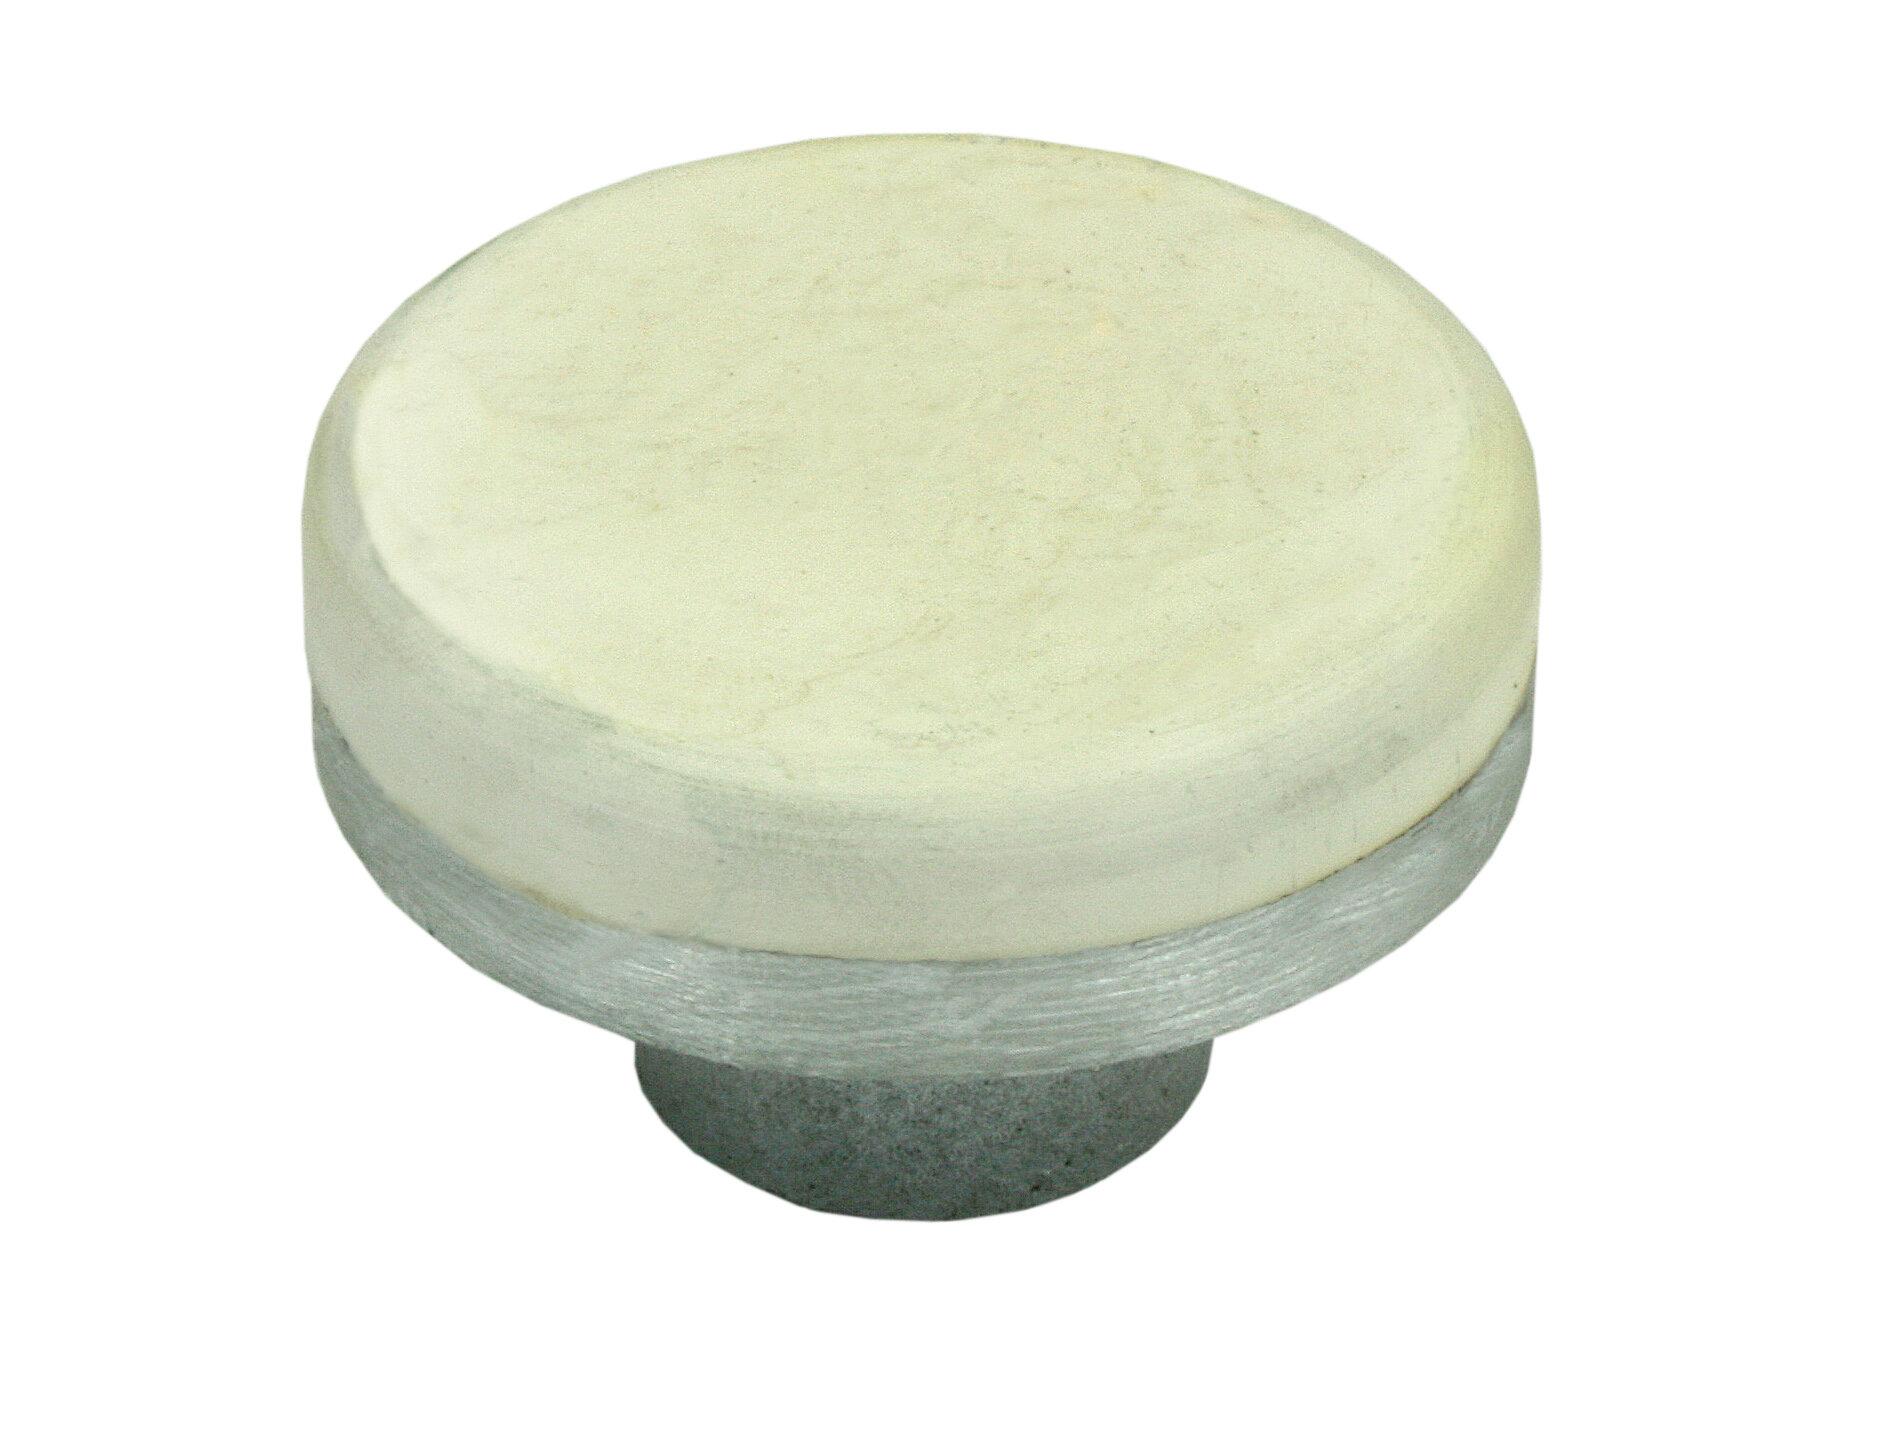 Large Round Flat Top Pressure Pad